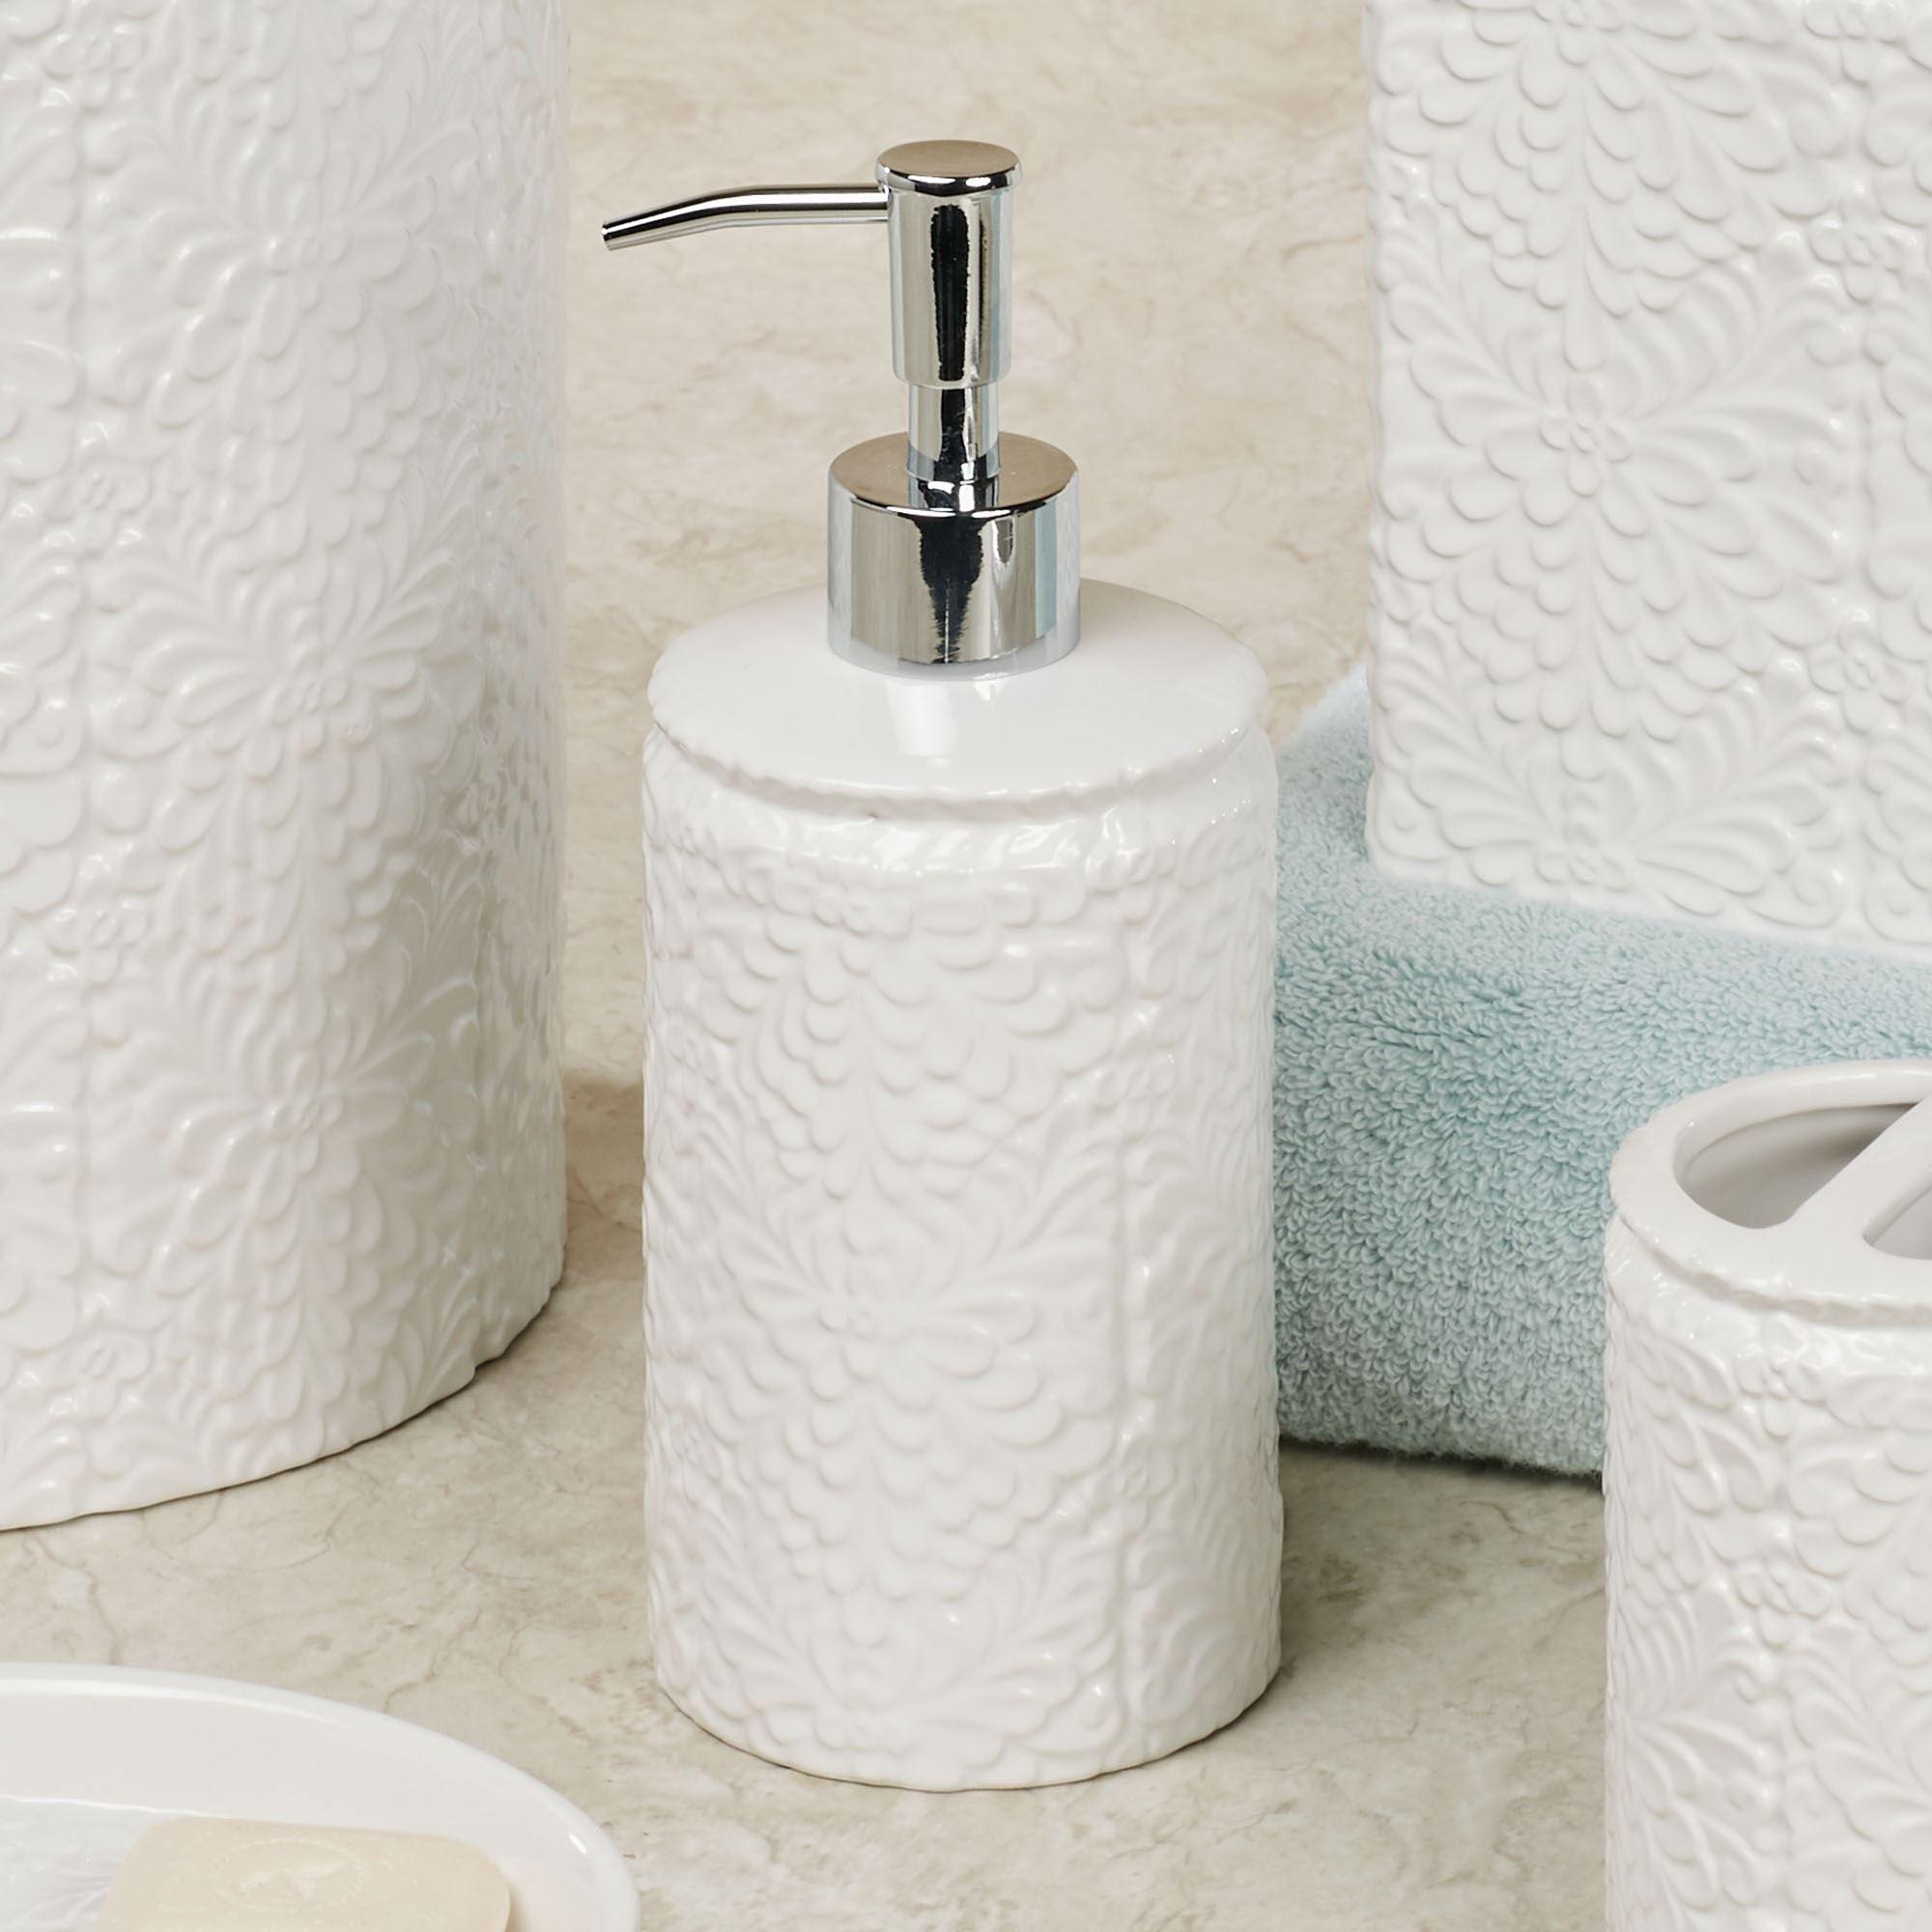 Best white porcelain bathroom accessories ideas bathtub for White toilet accessories